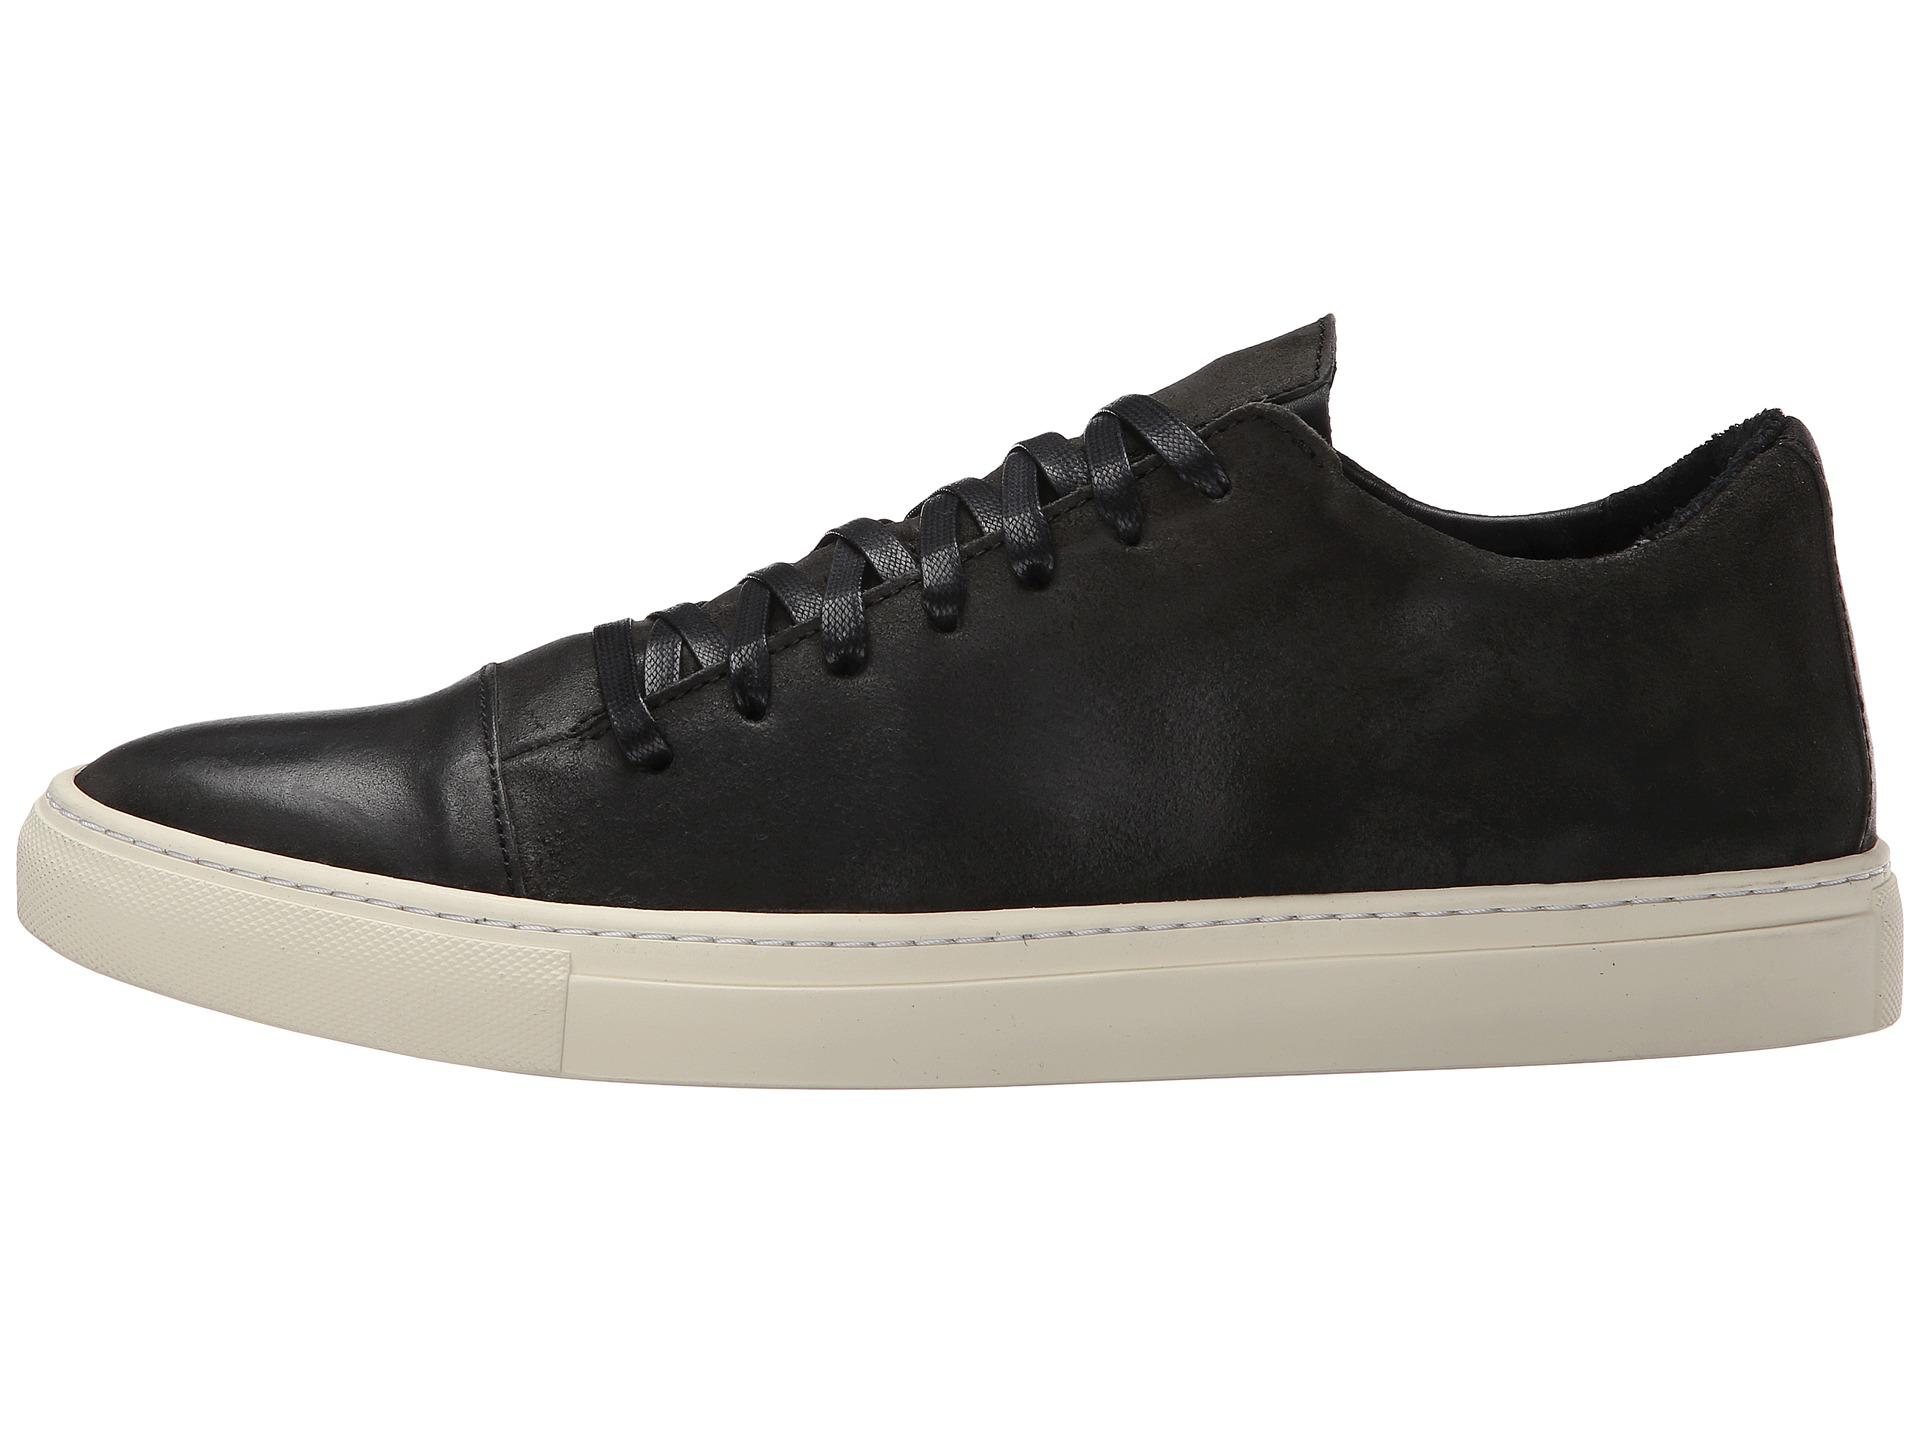 Reed Low Top Sneaker John Varvatos Collection lFoH8vm1F